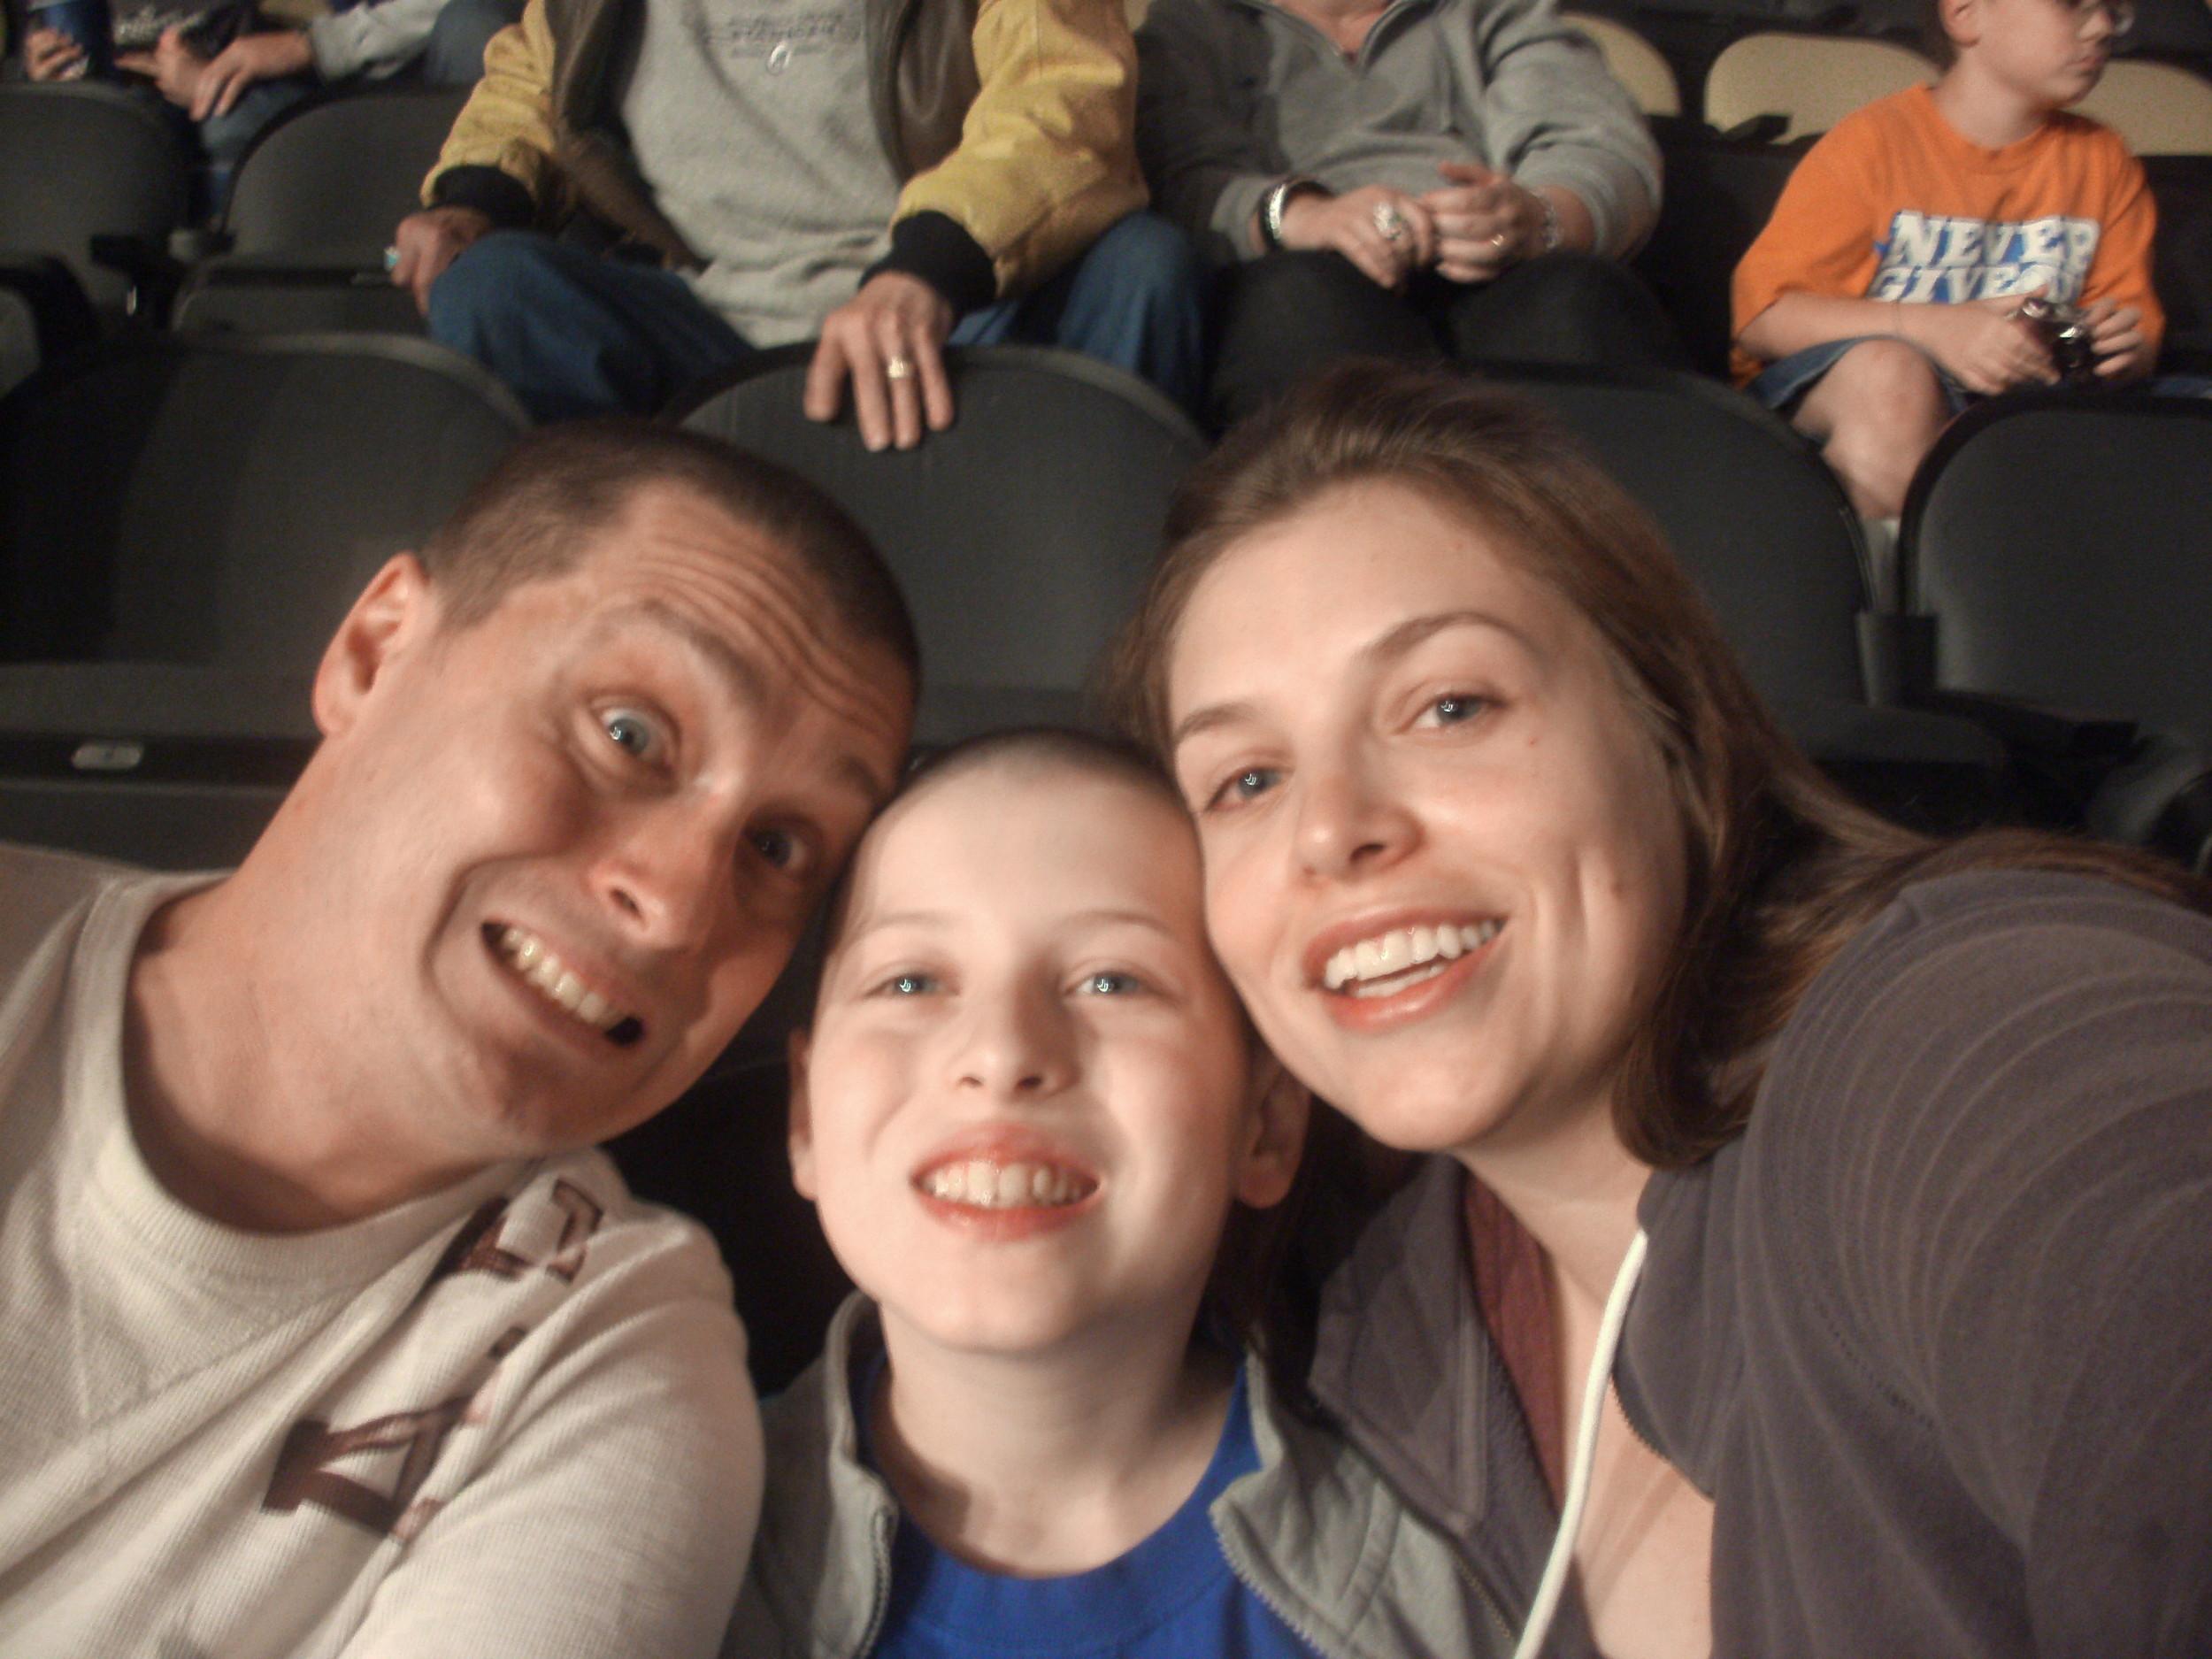 Joe Keslar - diagnosed at age 22, he is now a ten year survivor.